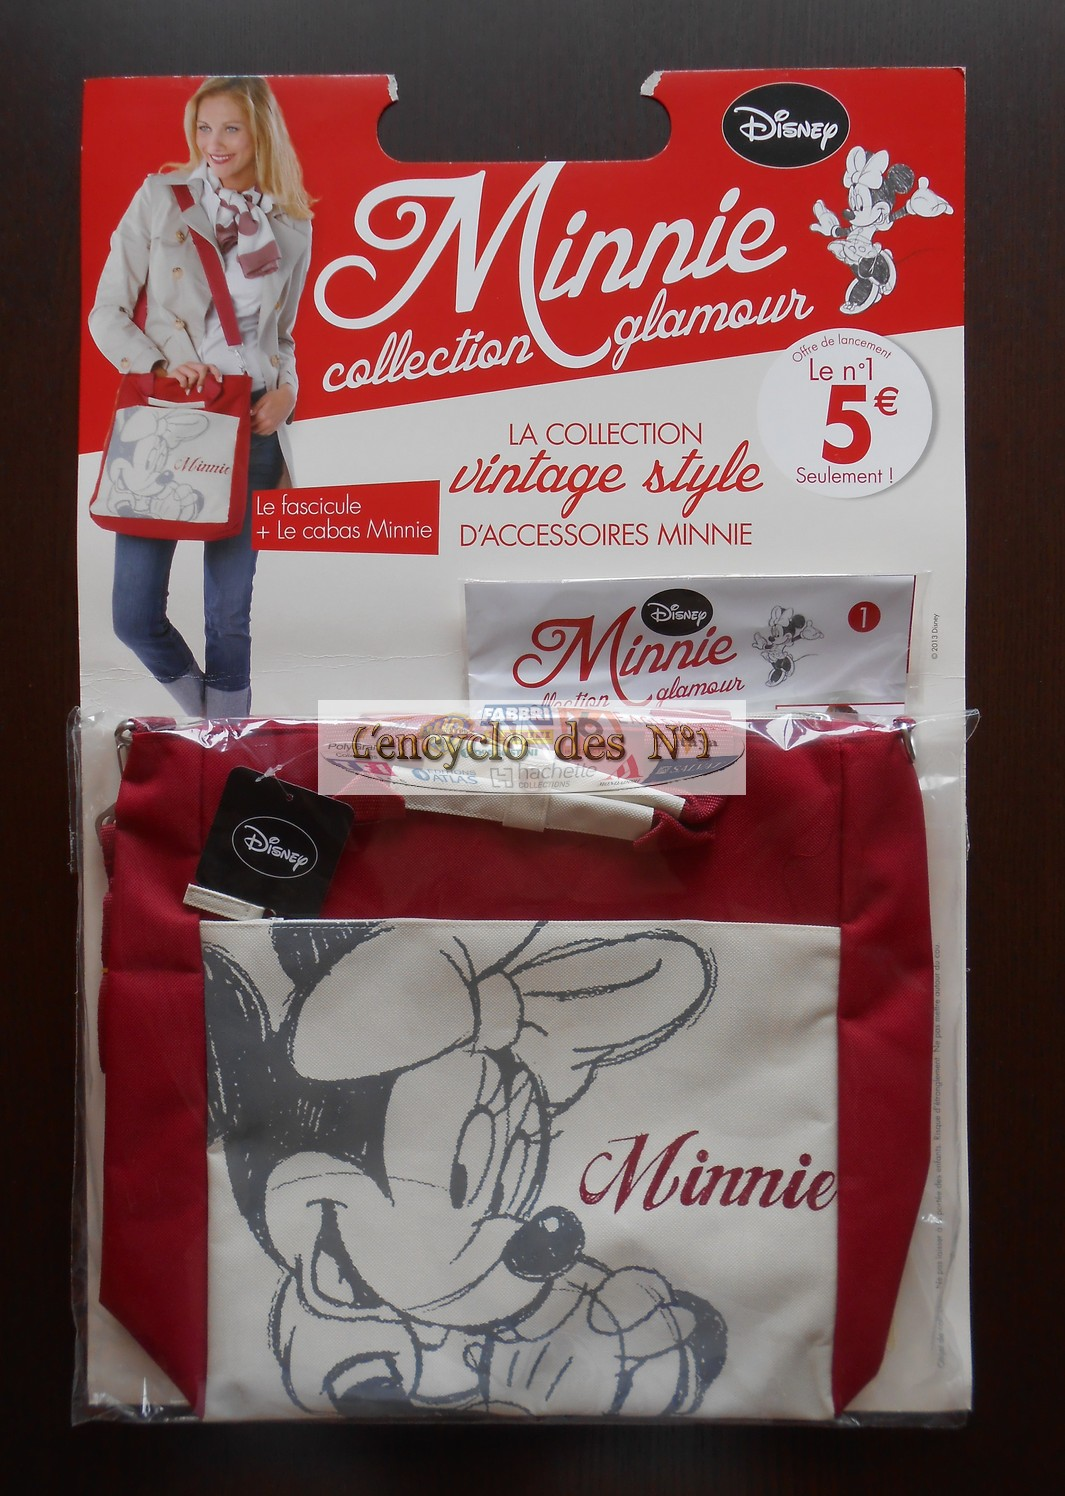 N° 1 Minnie collection glamour - Hachette Test - Avril 2013 St3y5ytFq52UgyALisRFBuRiPqc